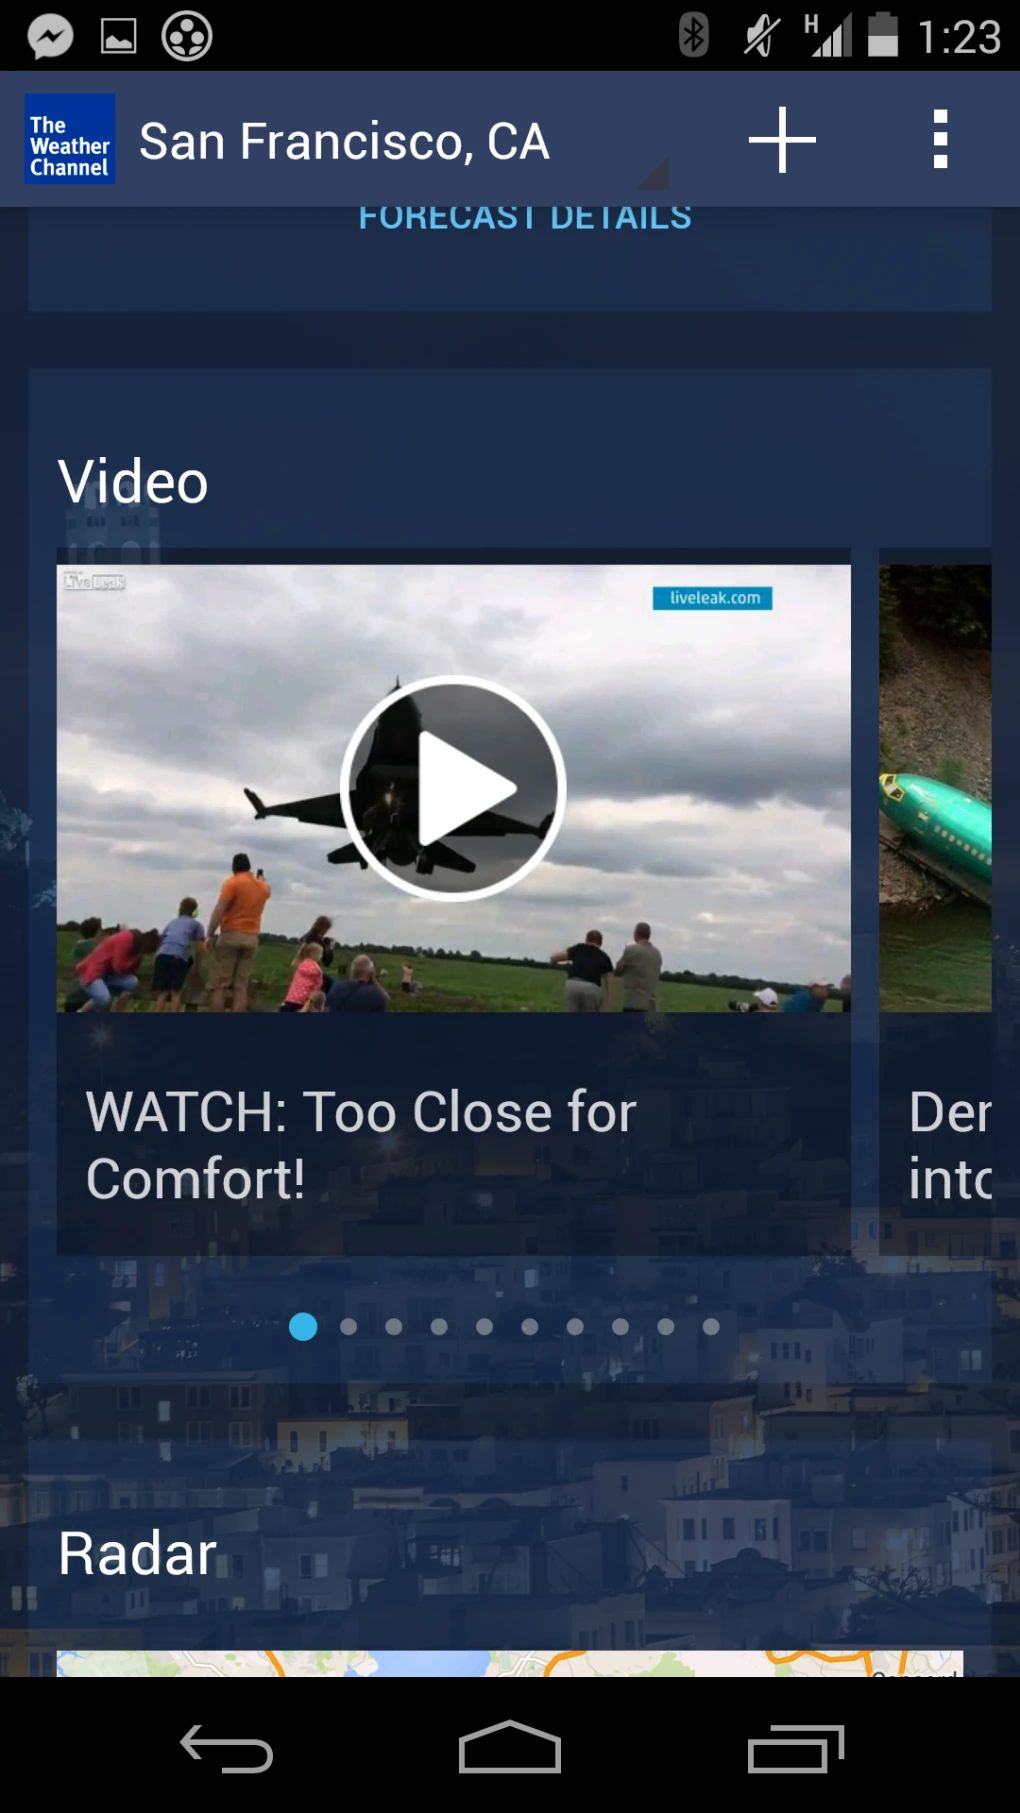 weather channel app won't download